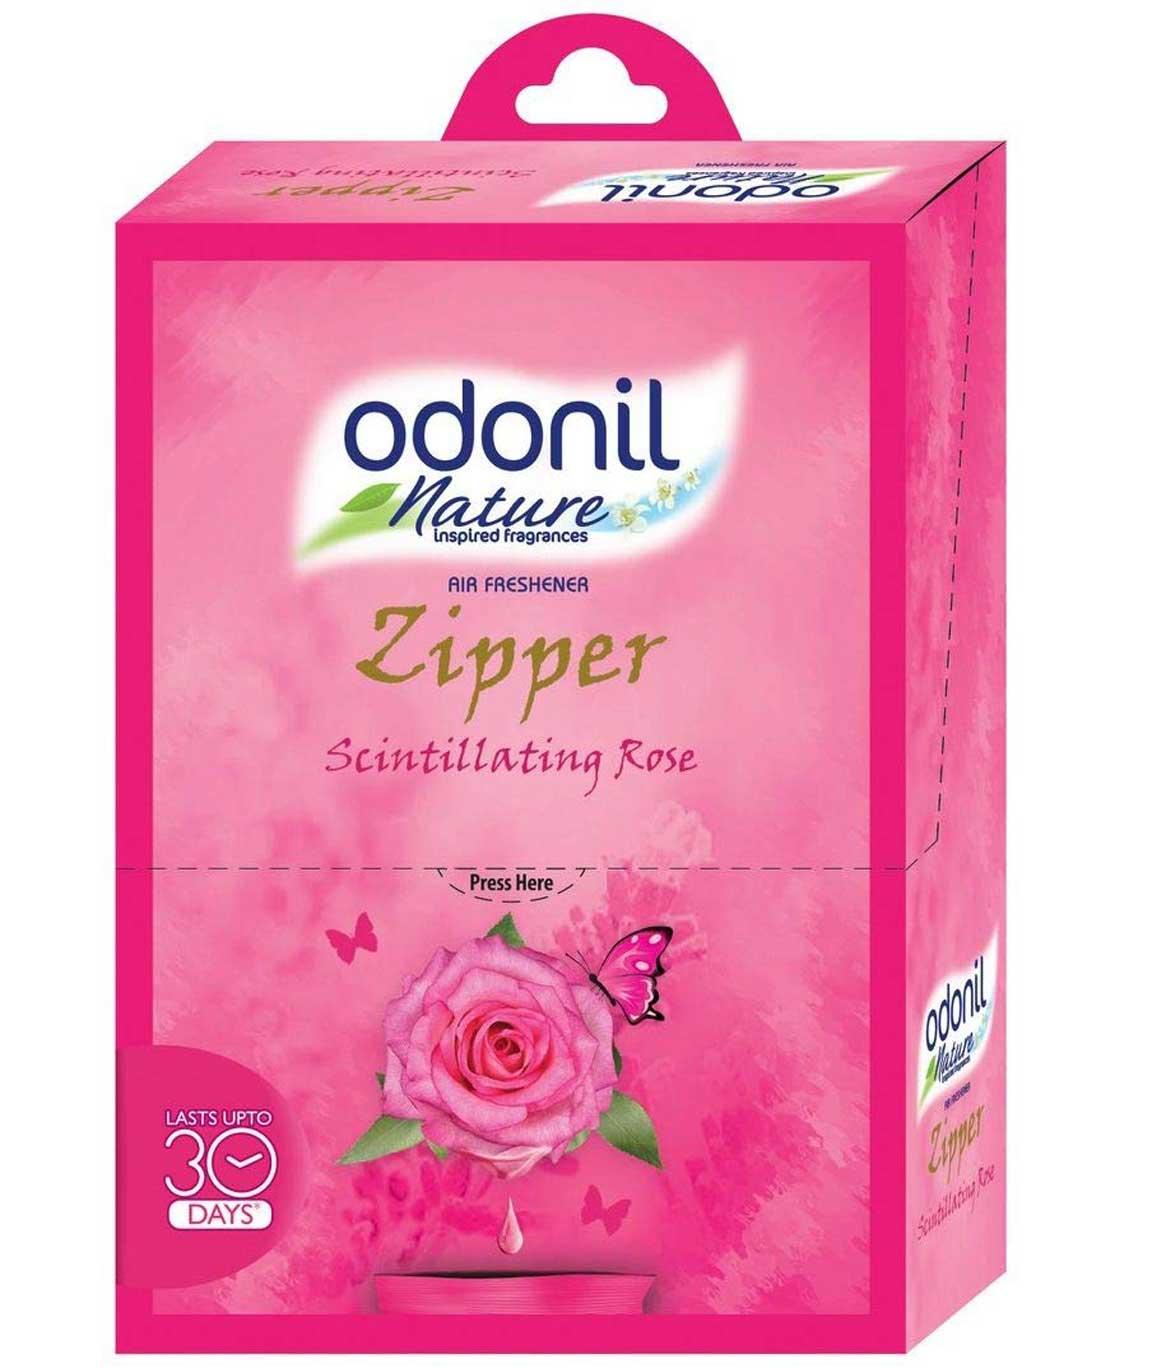 Odonil Airfreshener Zipper Scintillating Rose - 10 gm (Pack of 6)